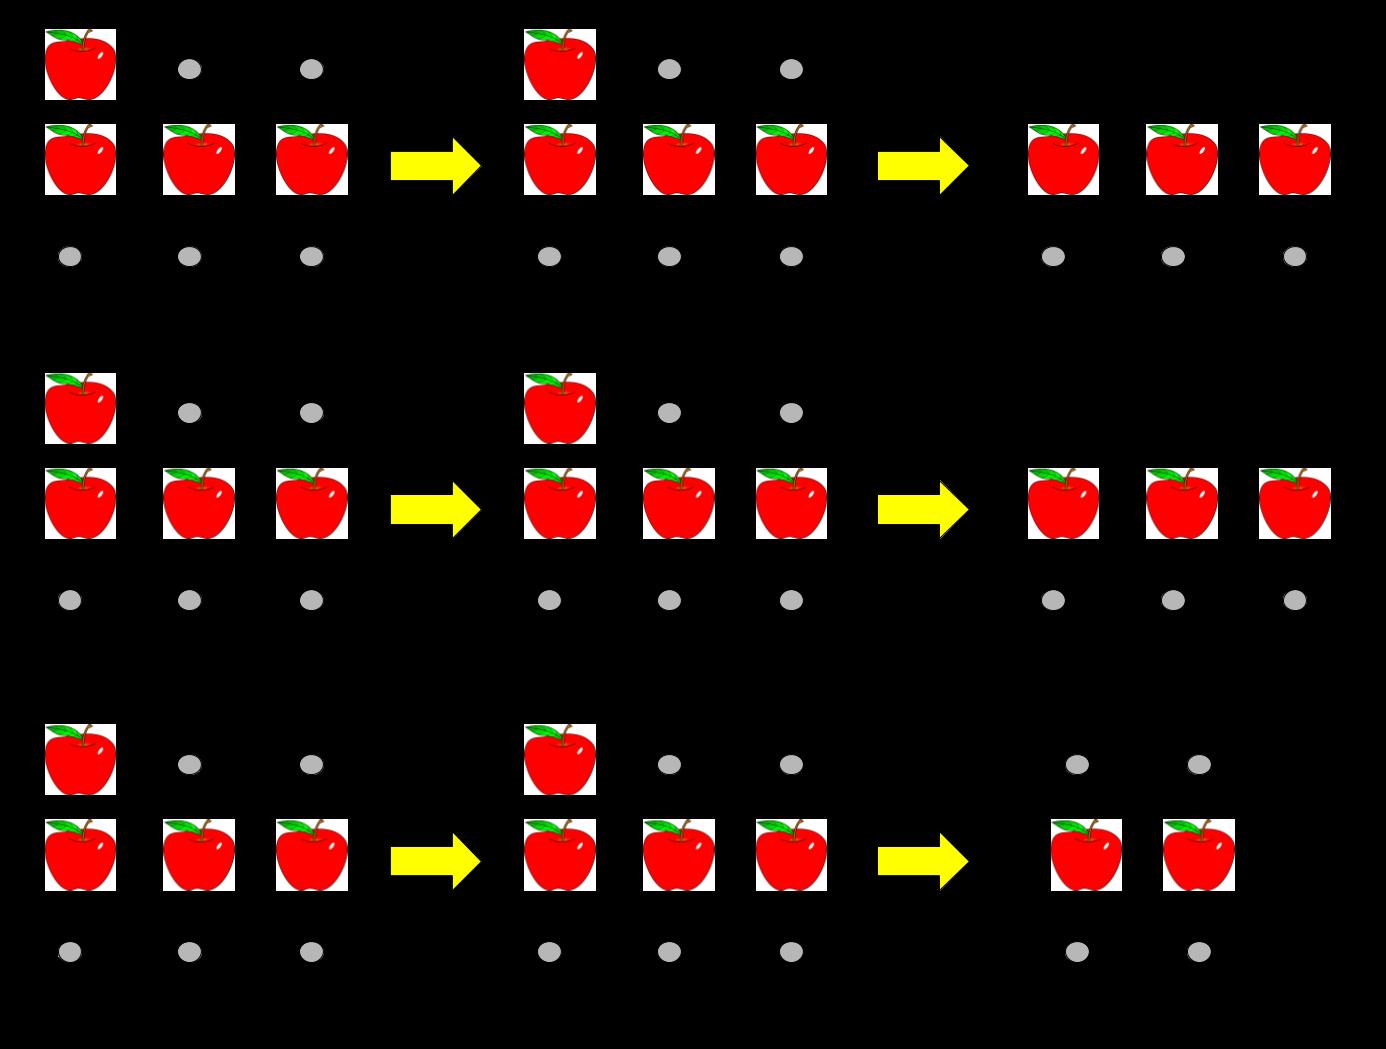 leetcode 5407. 切披萨的方案数(难度:困难)